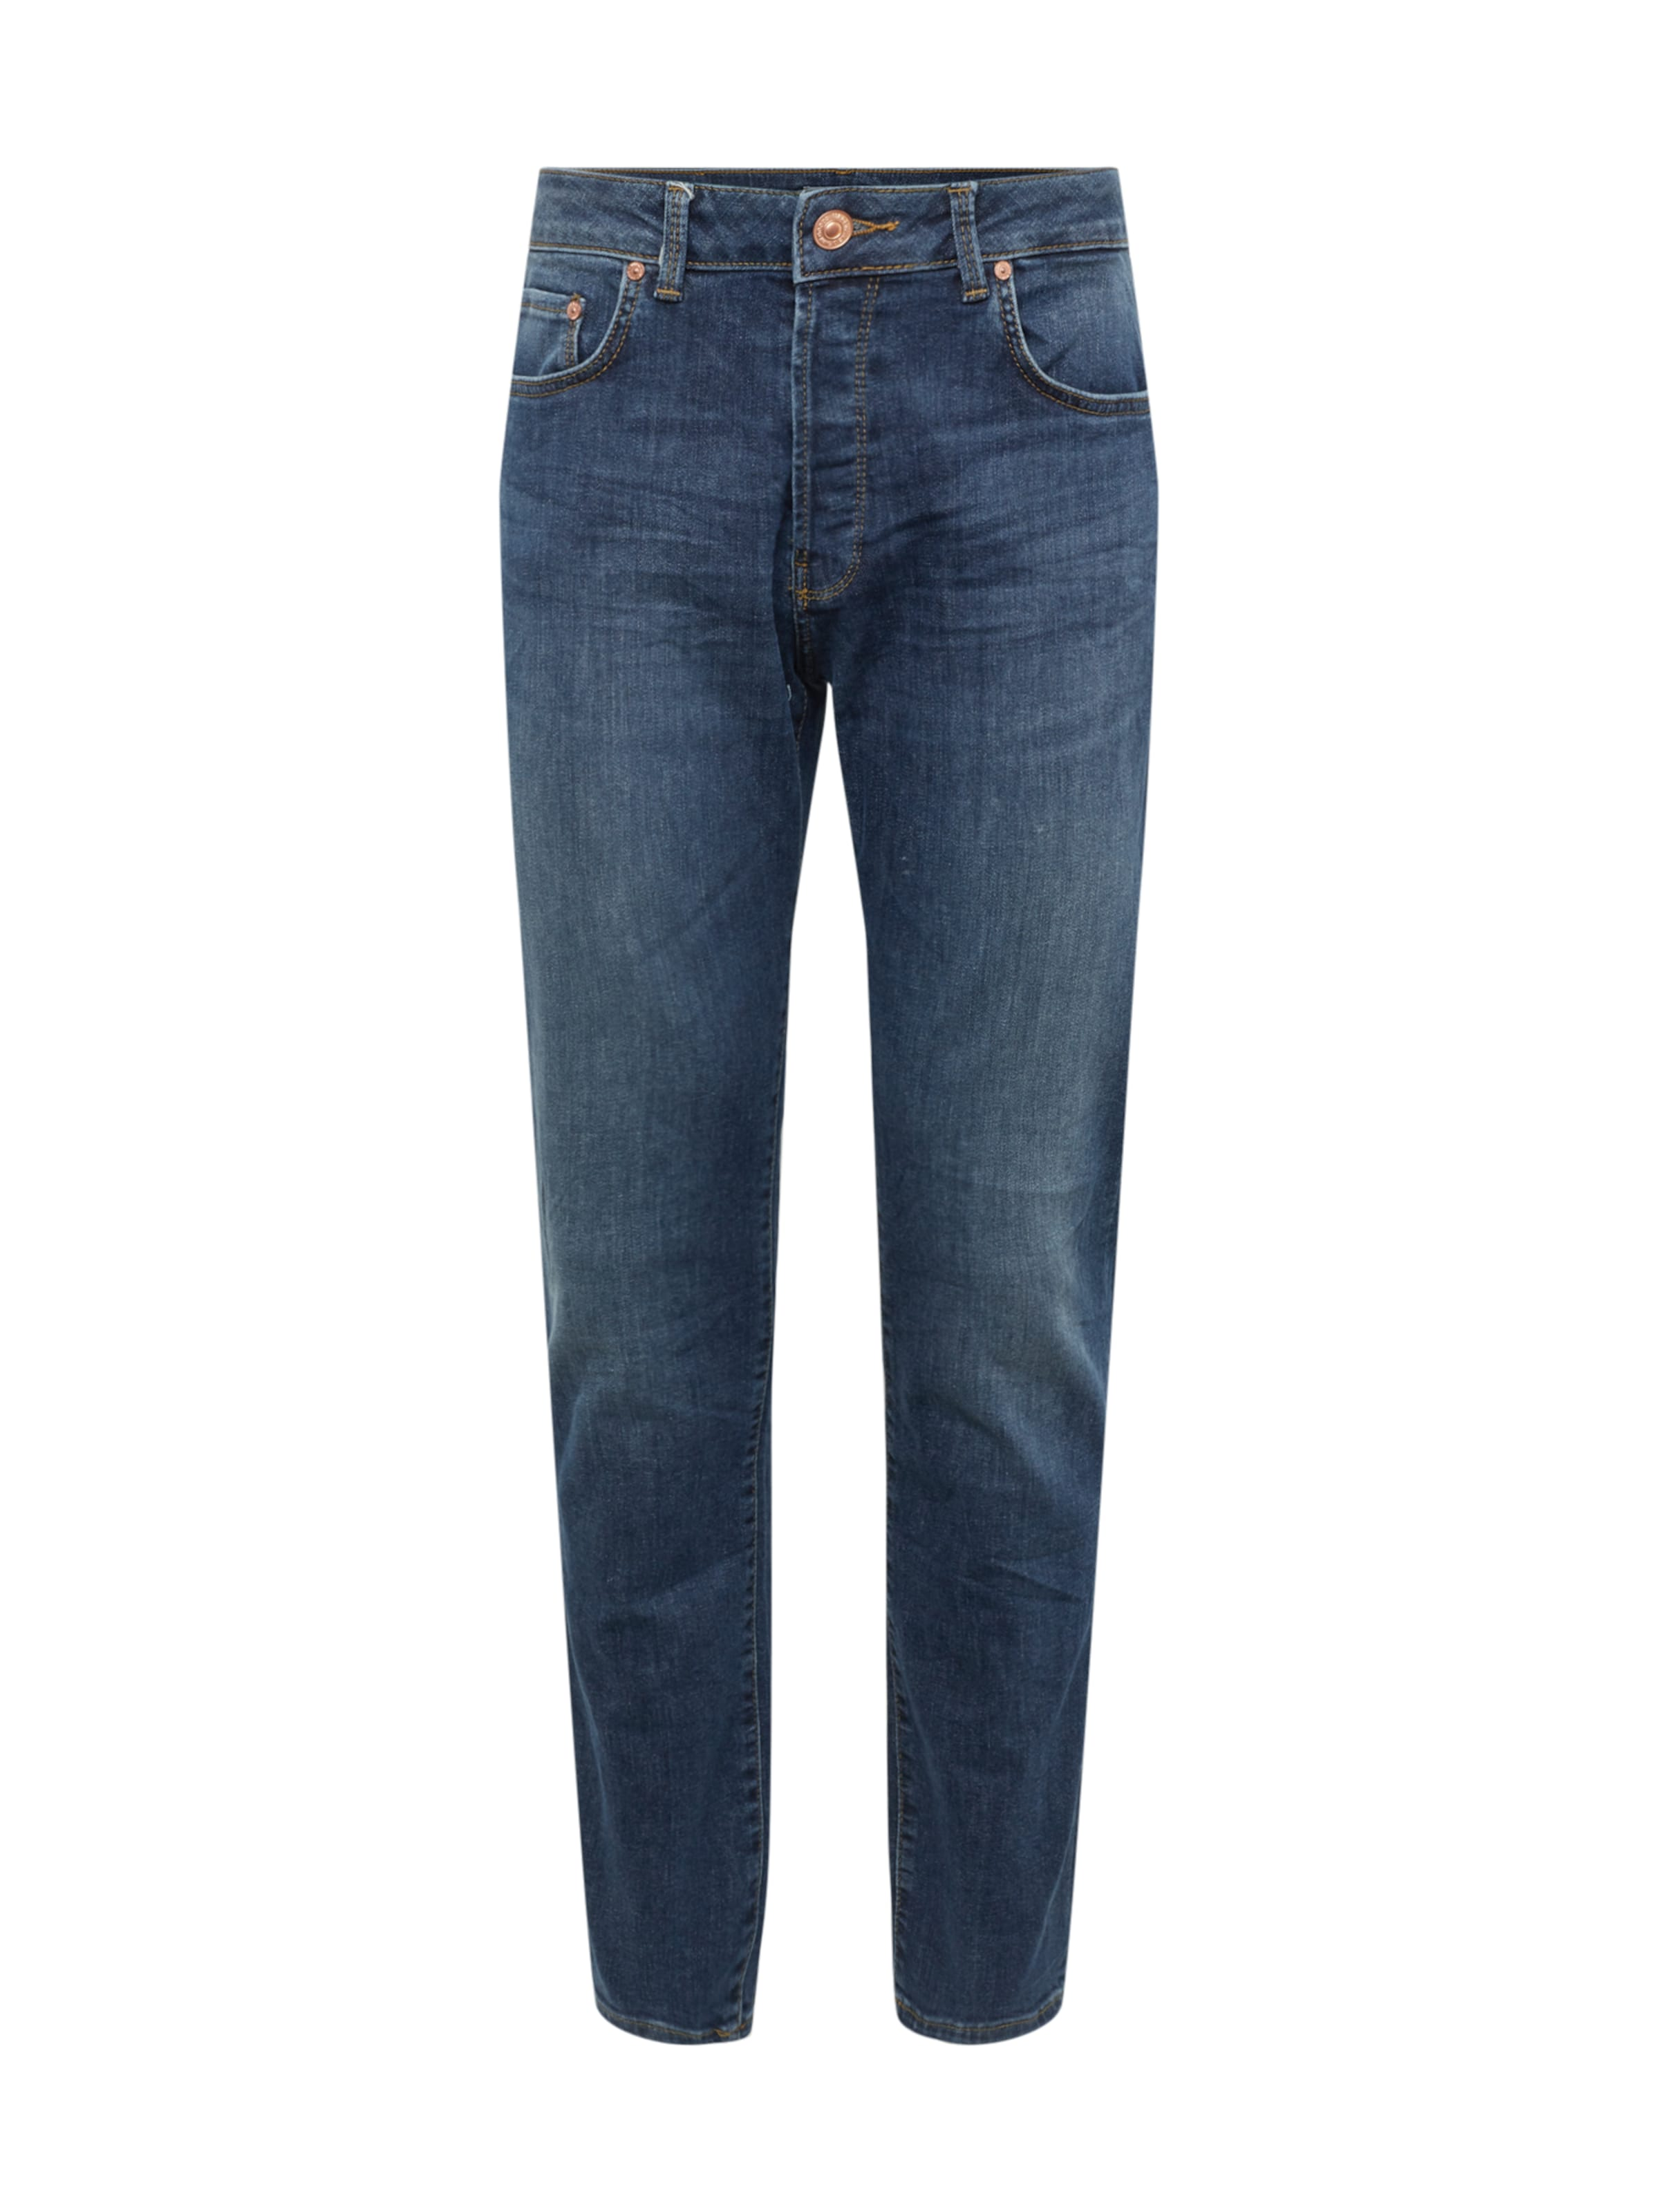 In Denim Blue Ltb Jeans D' 'hollywood 4Rjq5c3AL